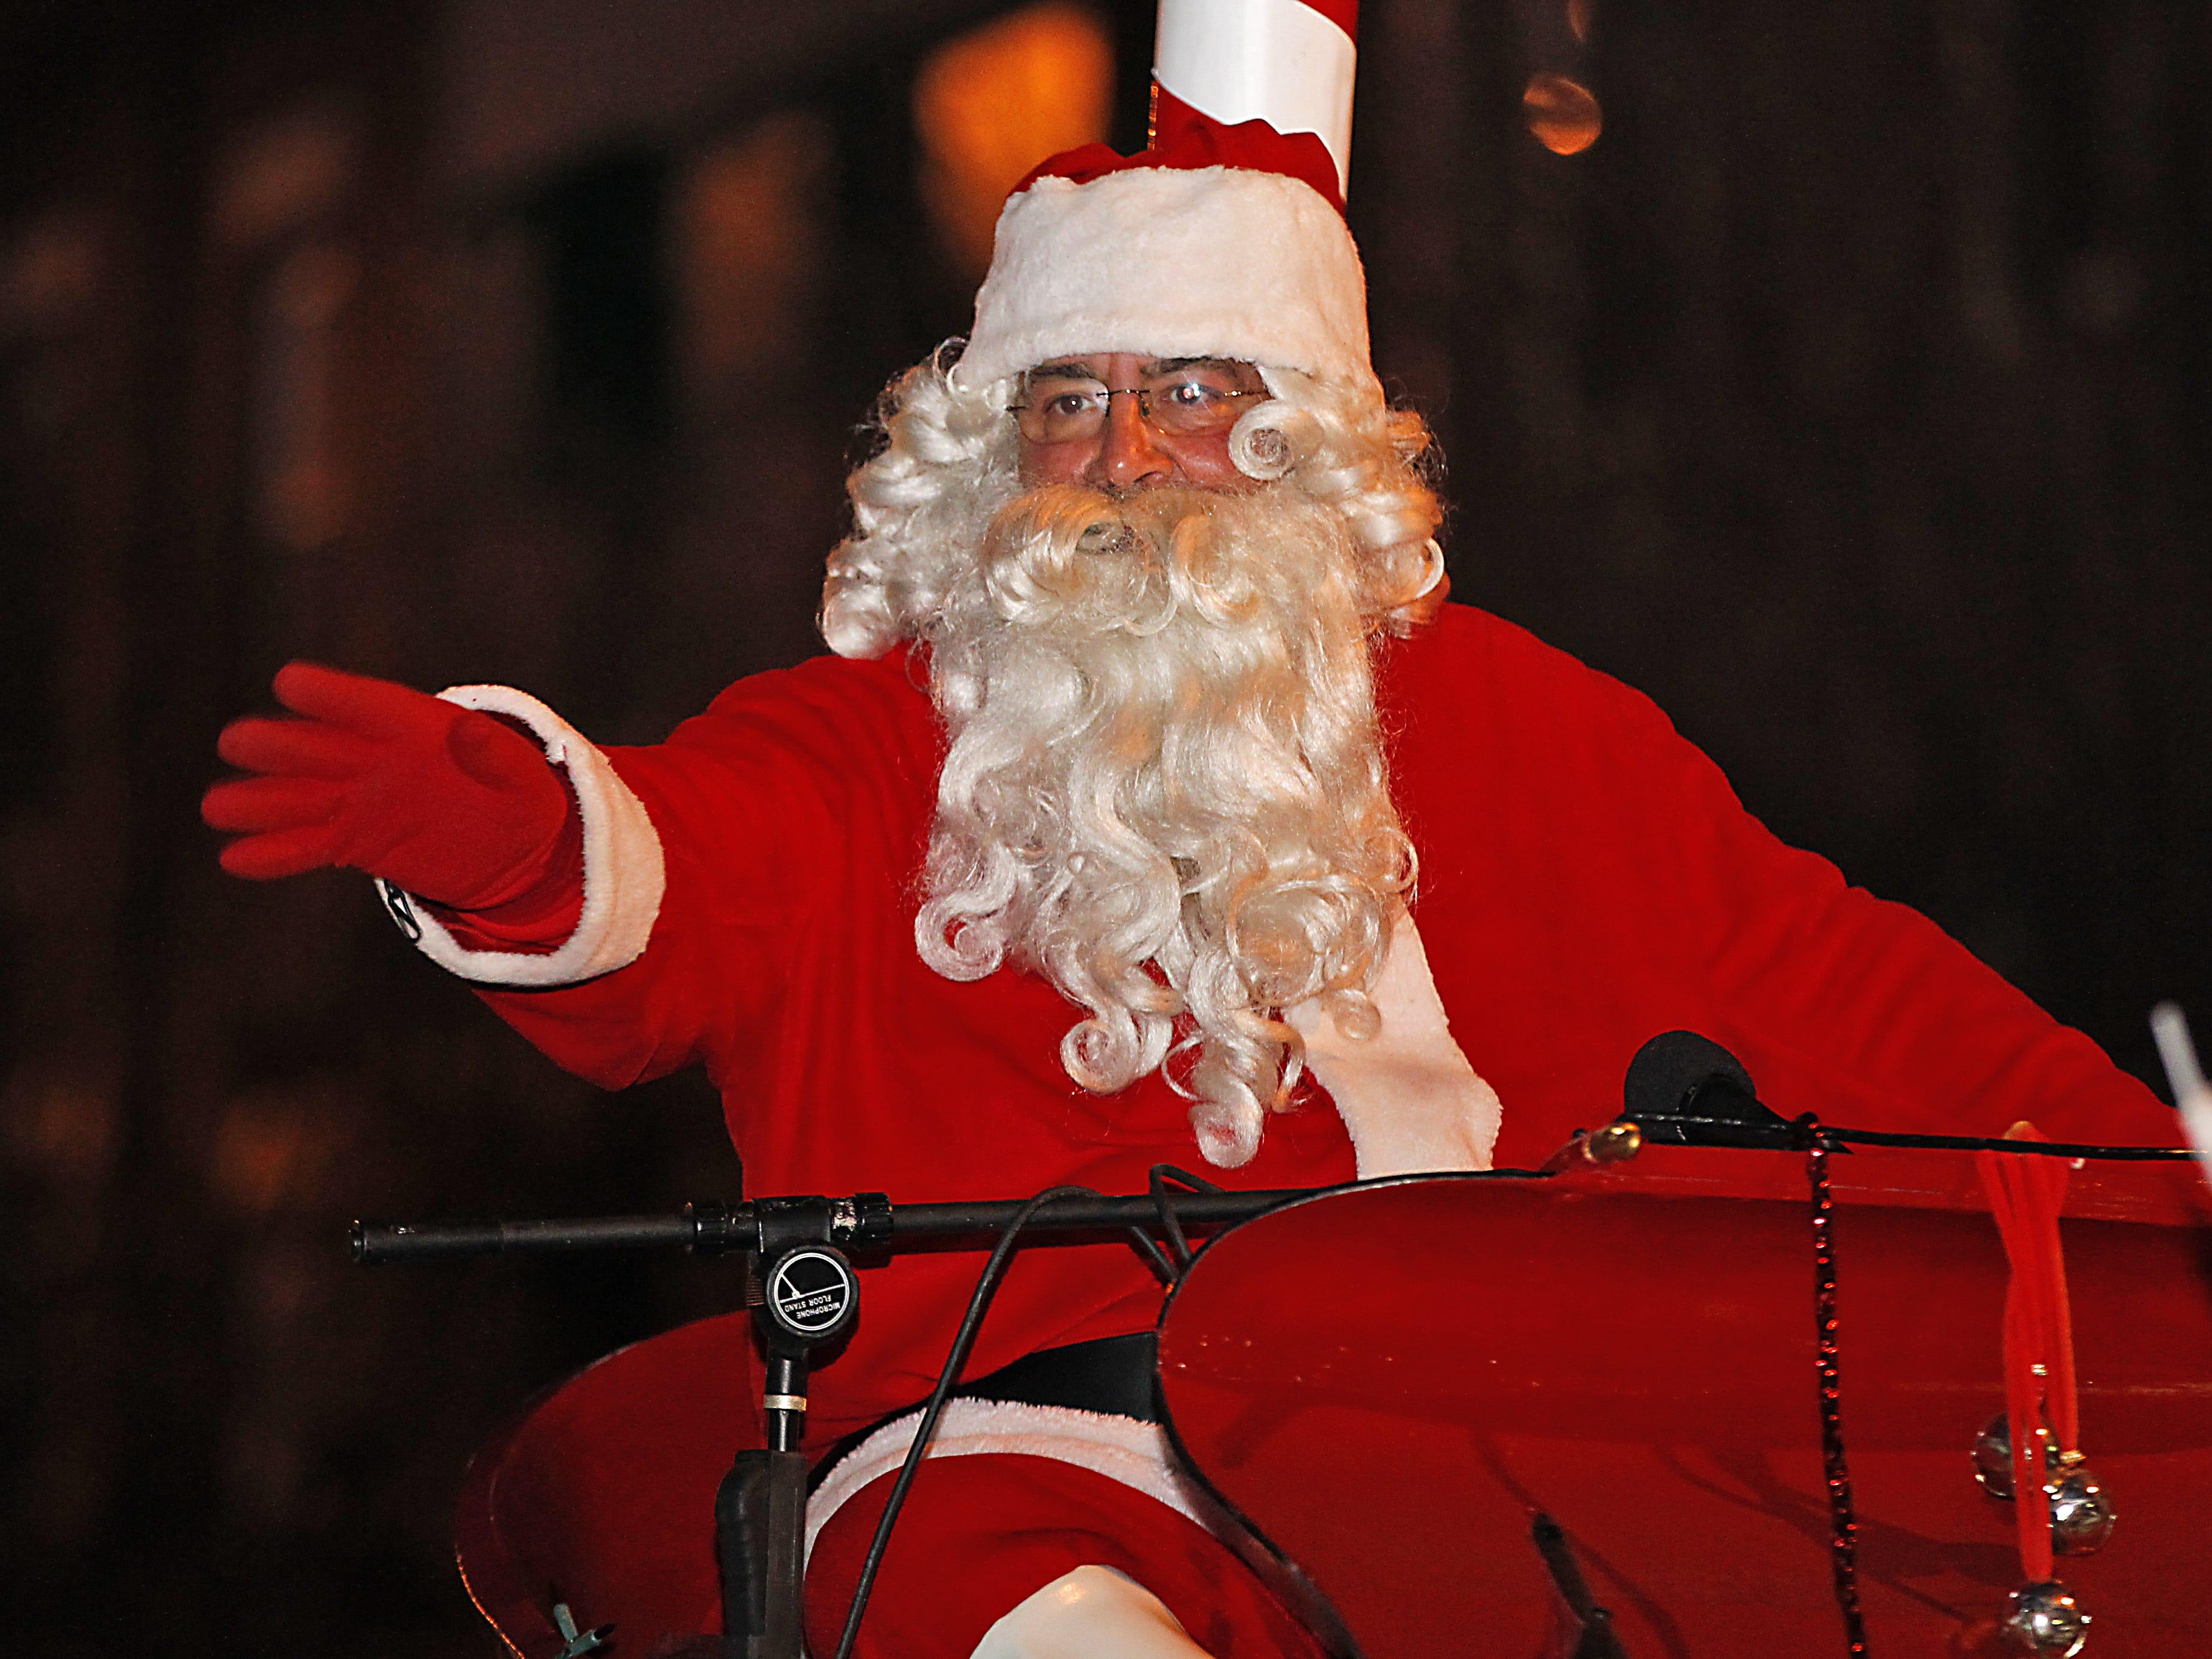 Santa makes an appearance Saturday at the Endicott Holiday Parade on Washington Avenue on Dec. 5, 2015.